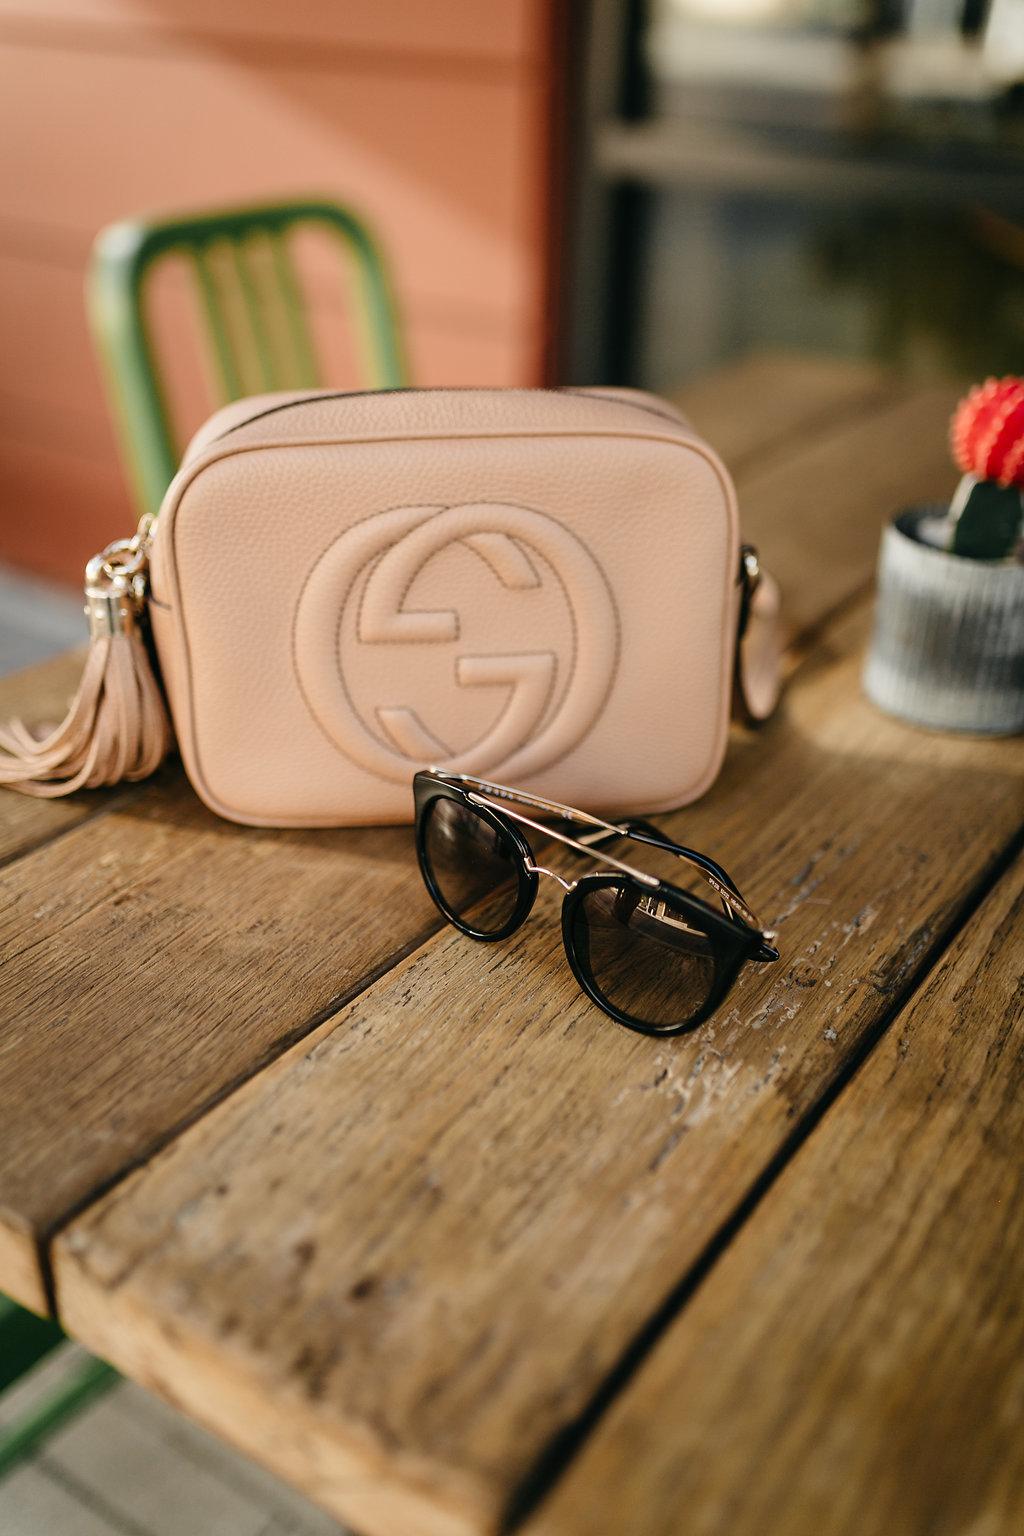 prada-sunglasses-gucci-bag